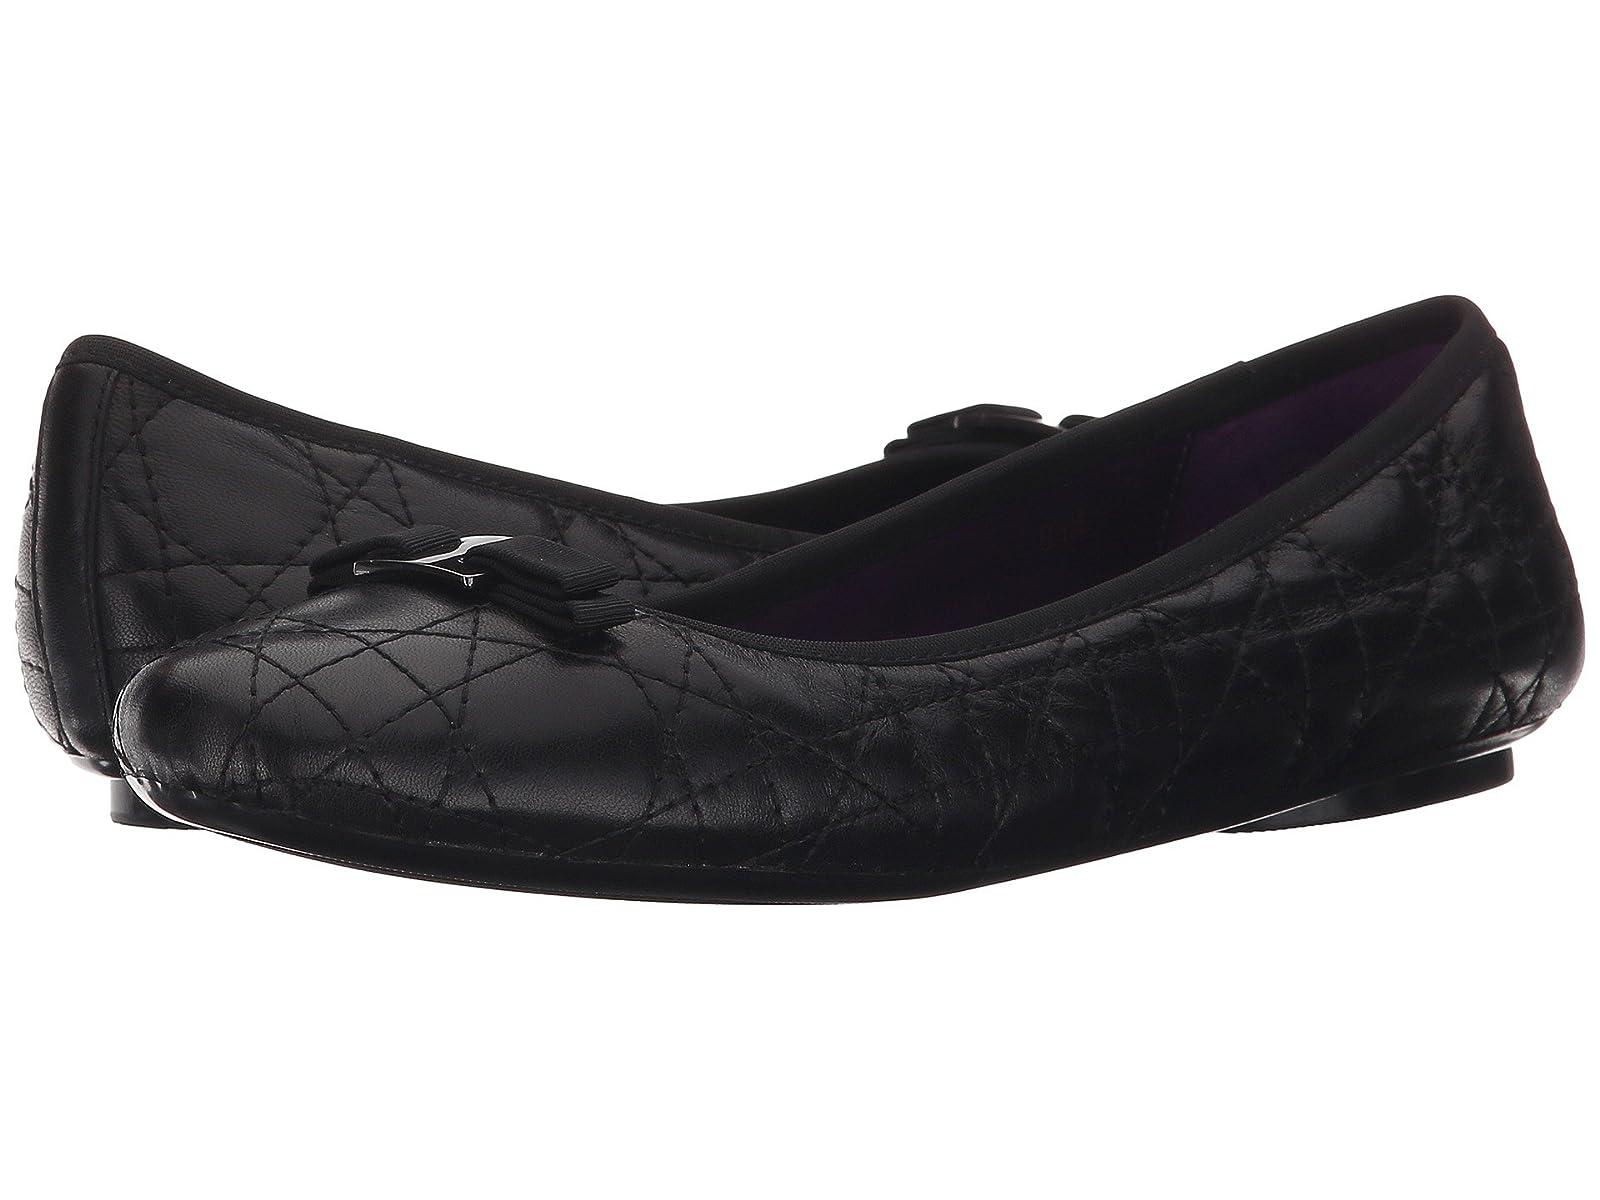 Vaneli BaffleCheap and distinctive eye-catching shoes